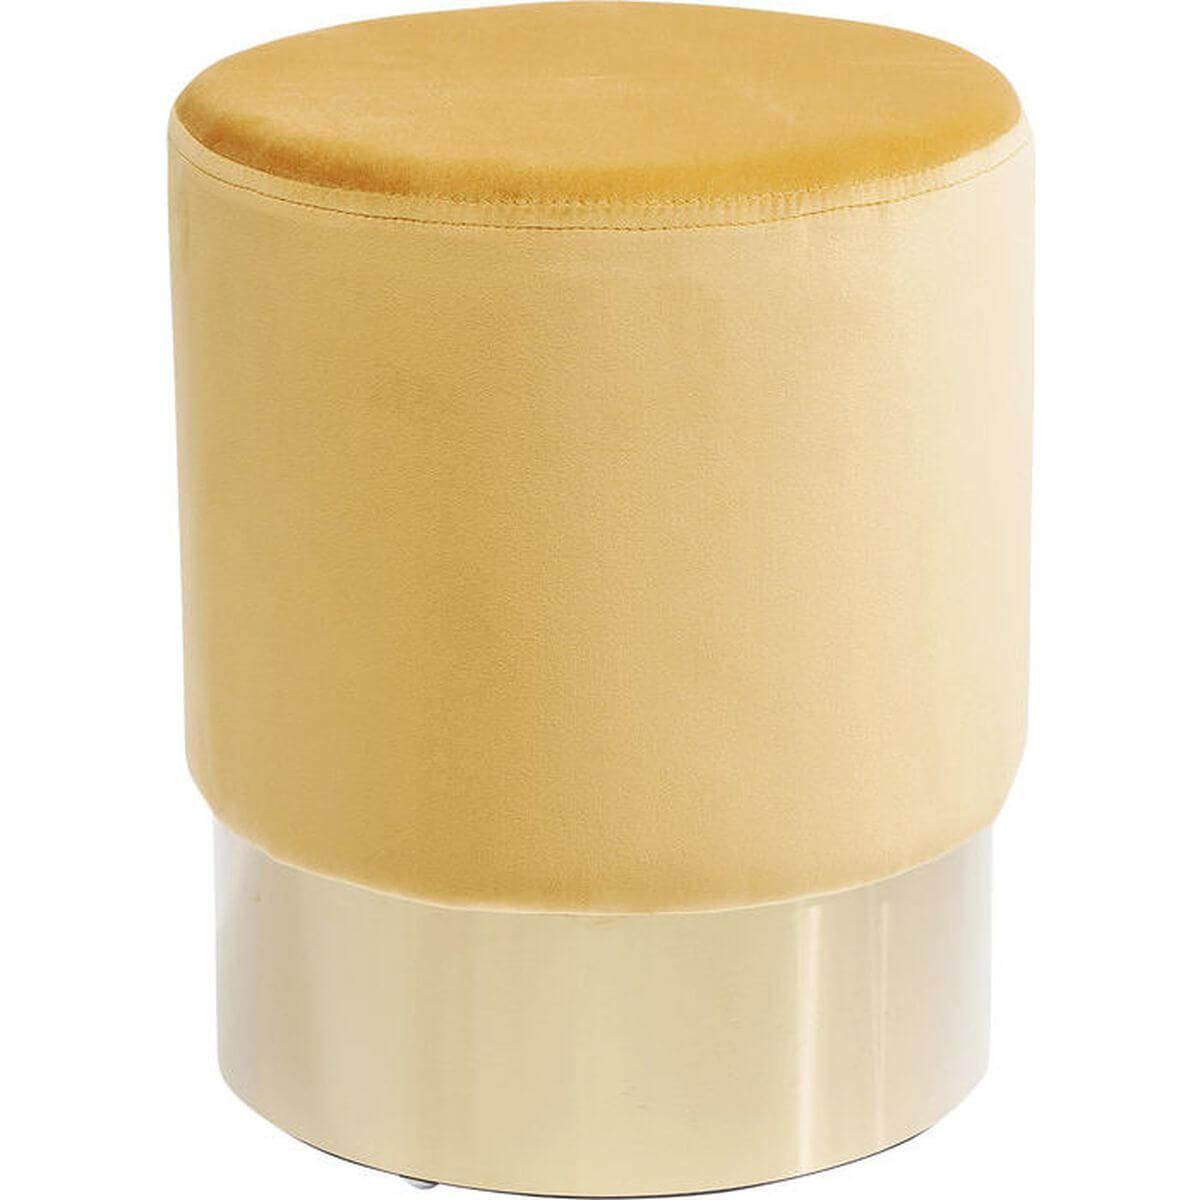 Tabouret CHERRY Kare Design orange/laiton 35cm